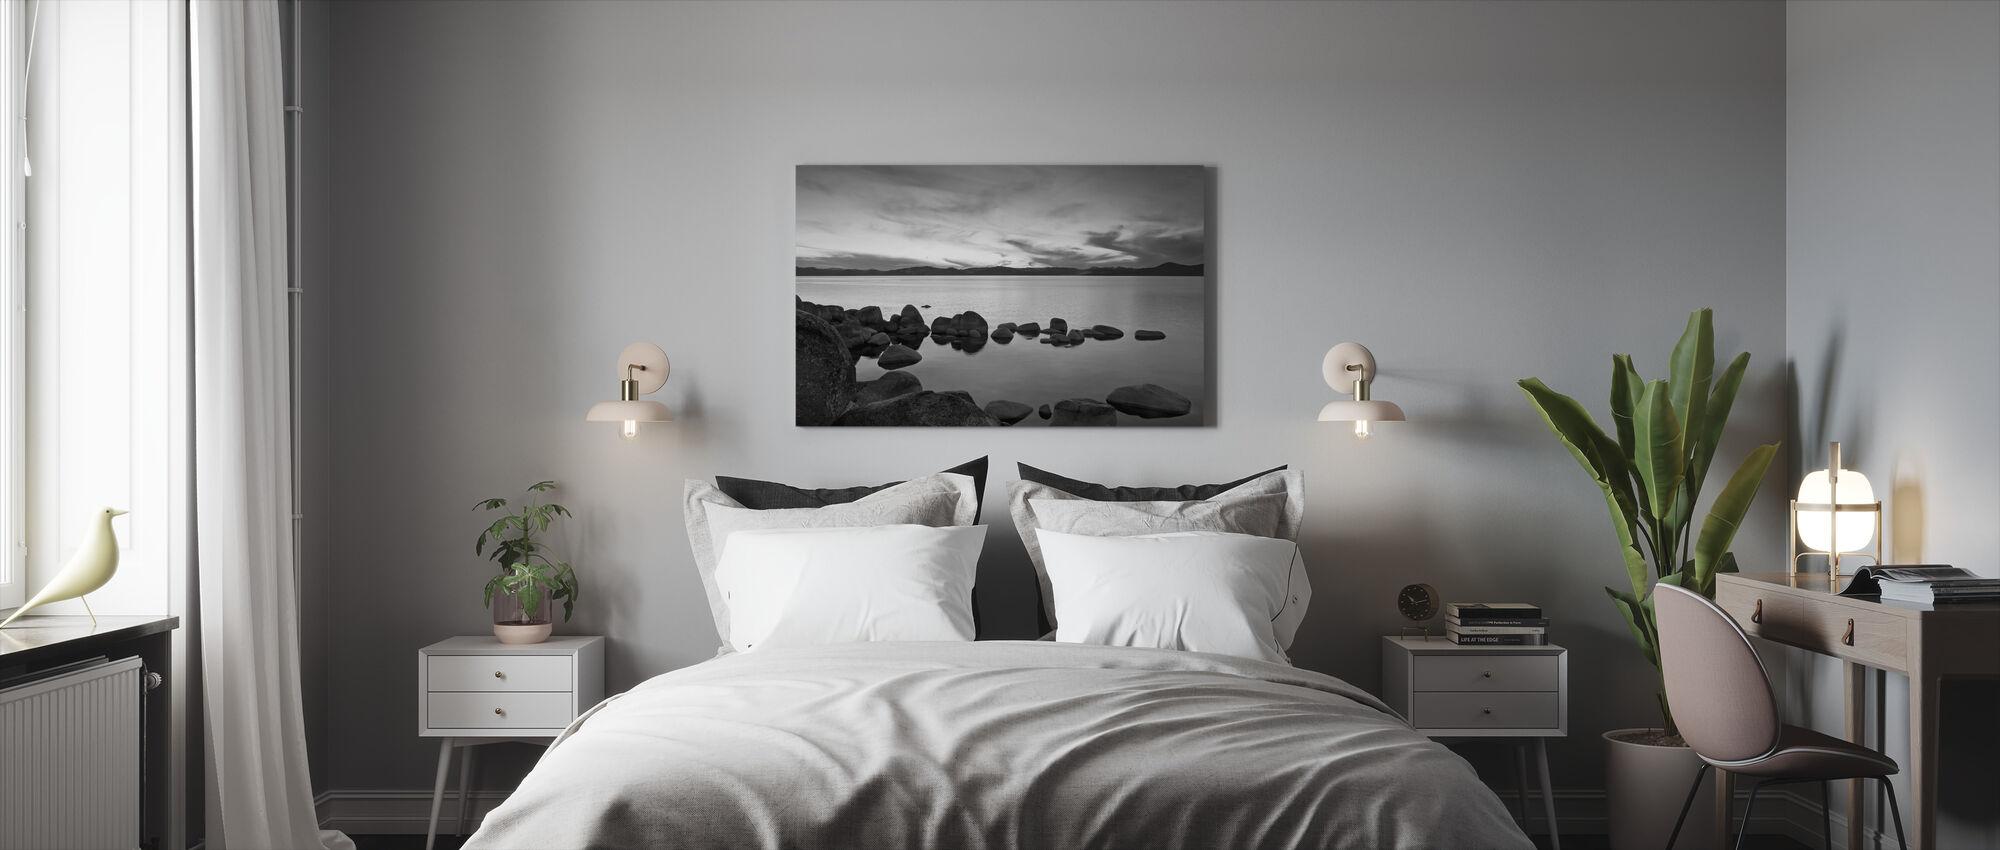 Lake Tahoe, Verenigde Staten - Canvas print - Slaapkamer